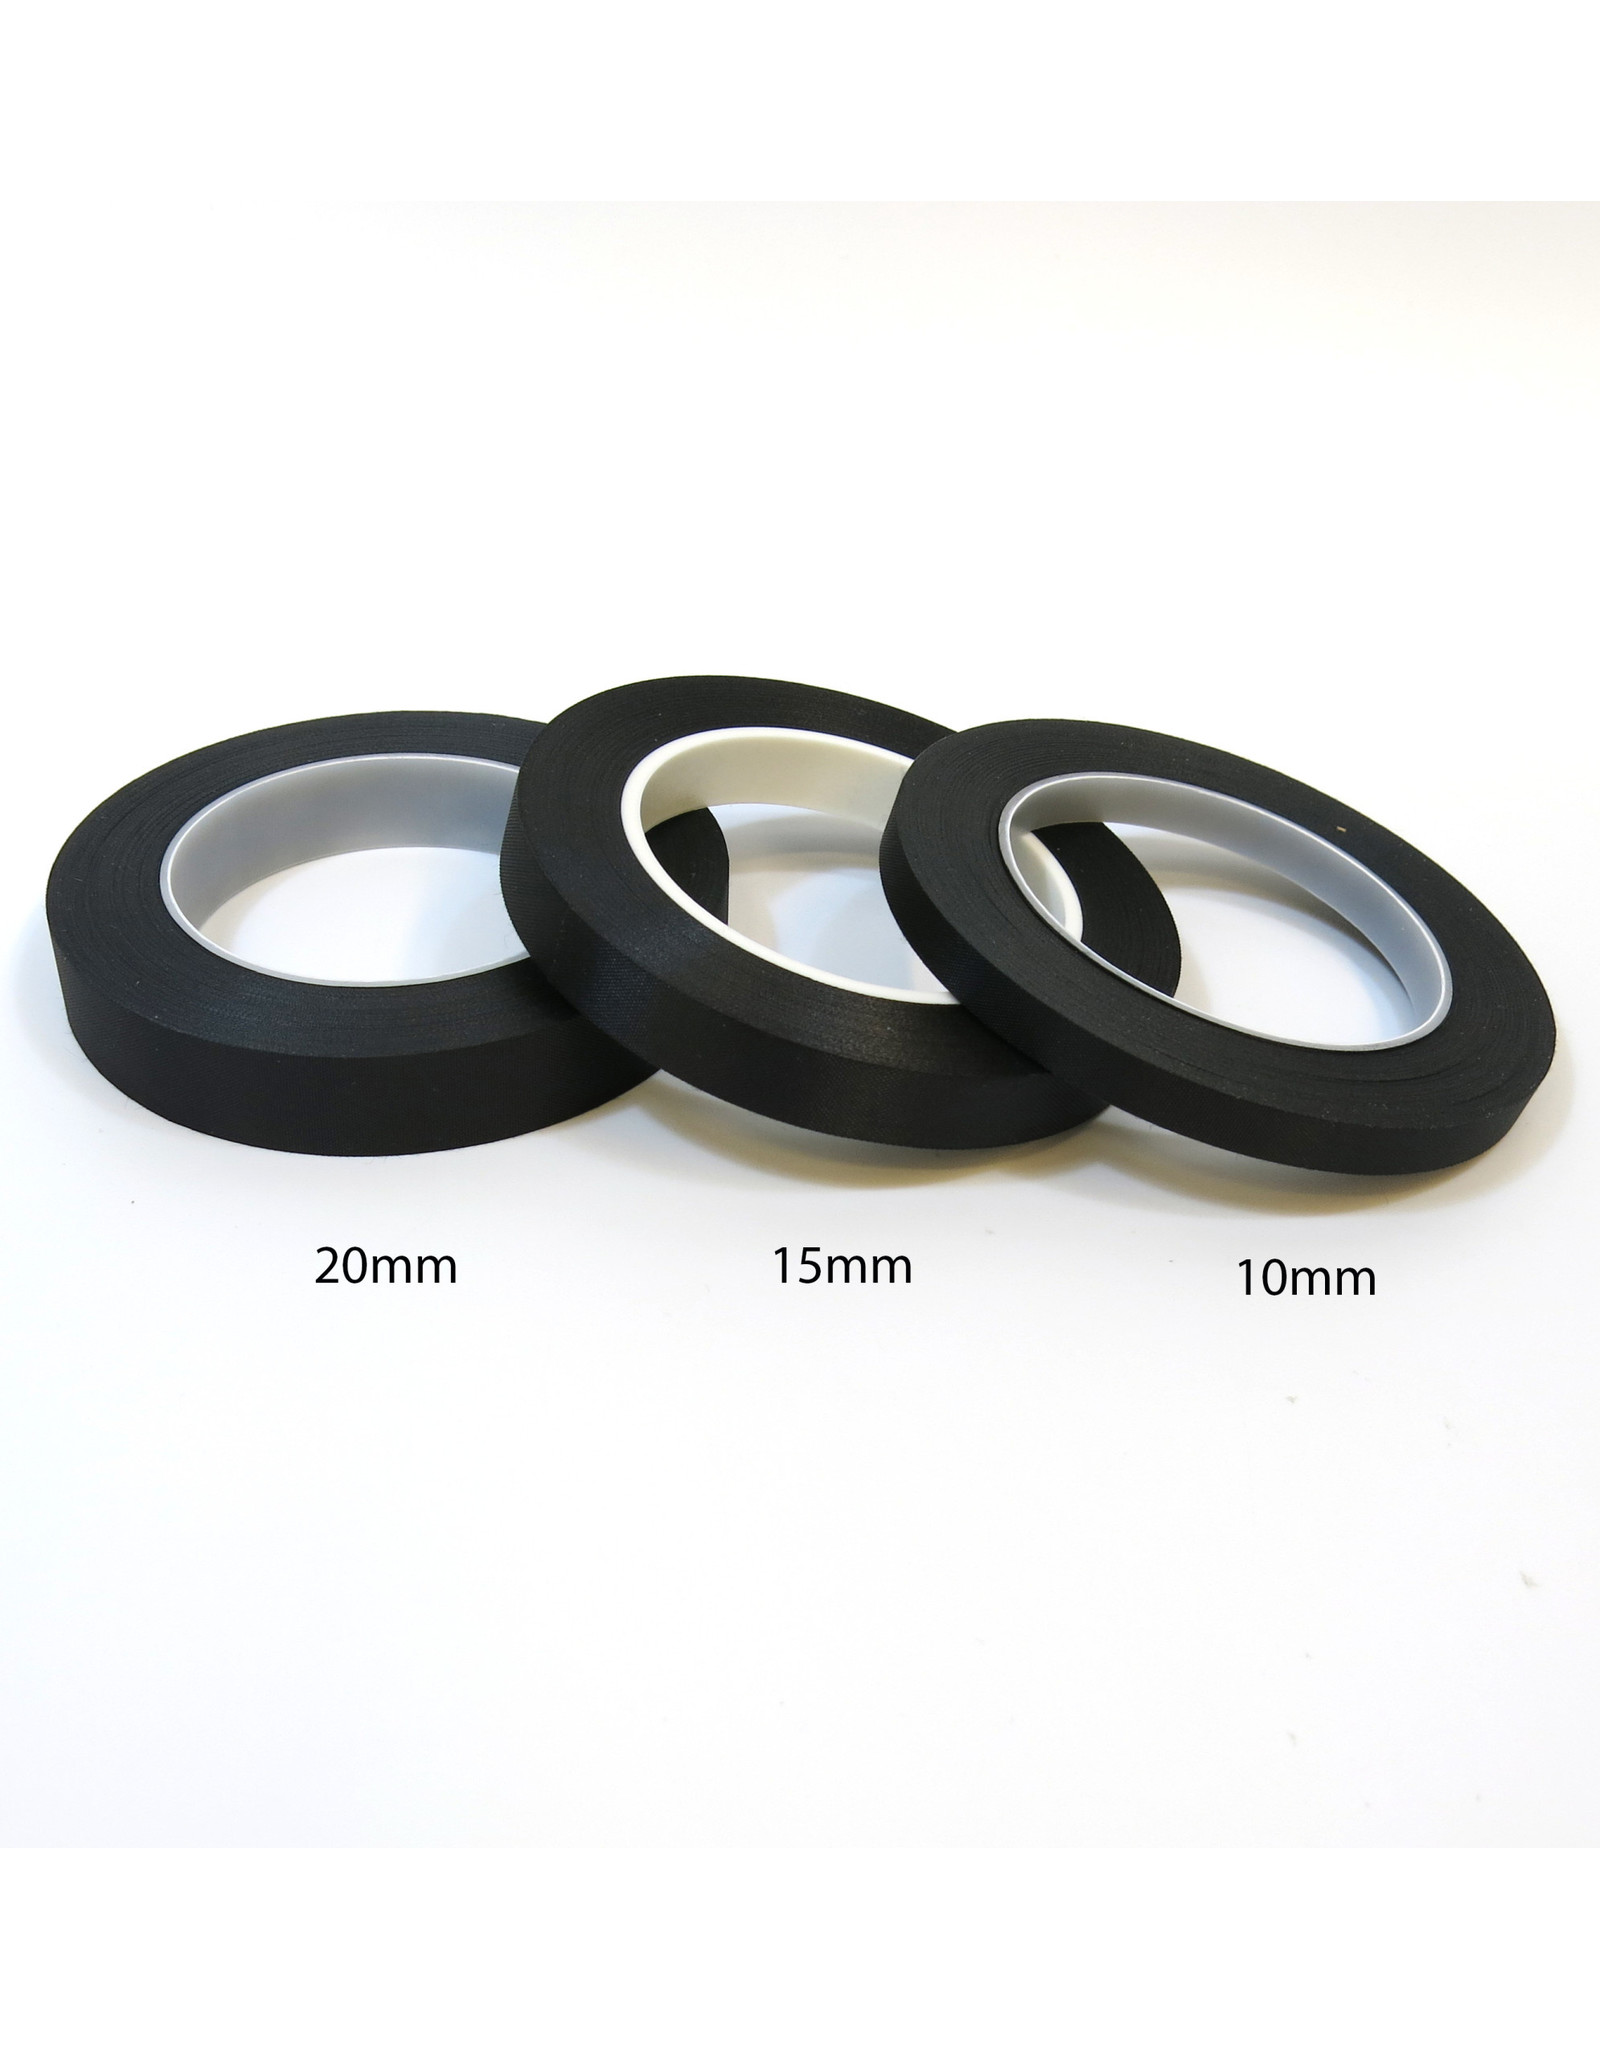 Nylon anti-stretch tape